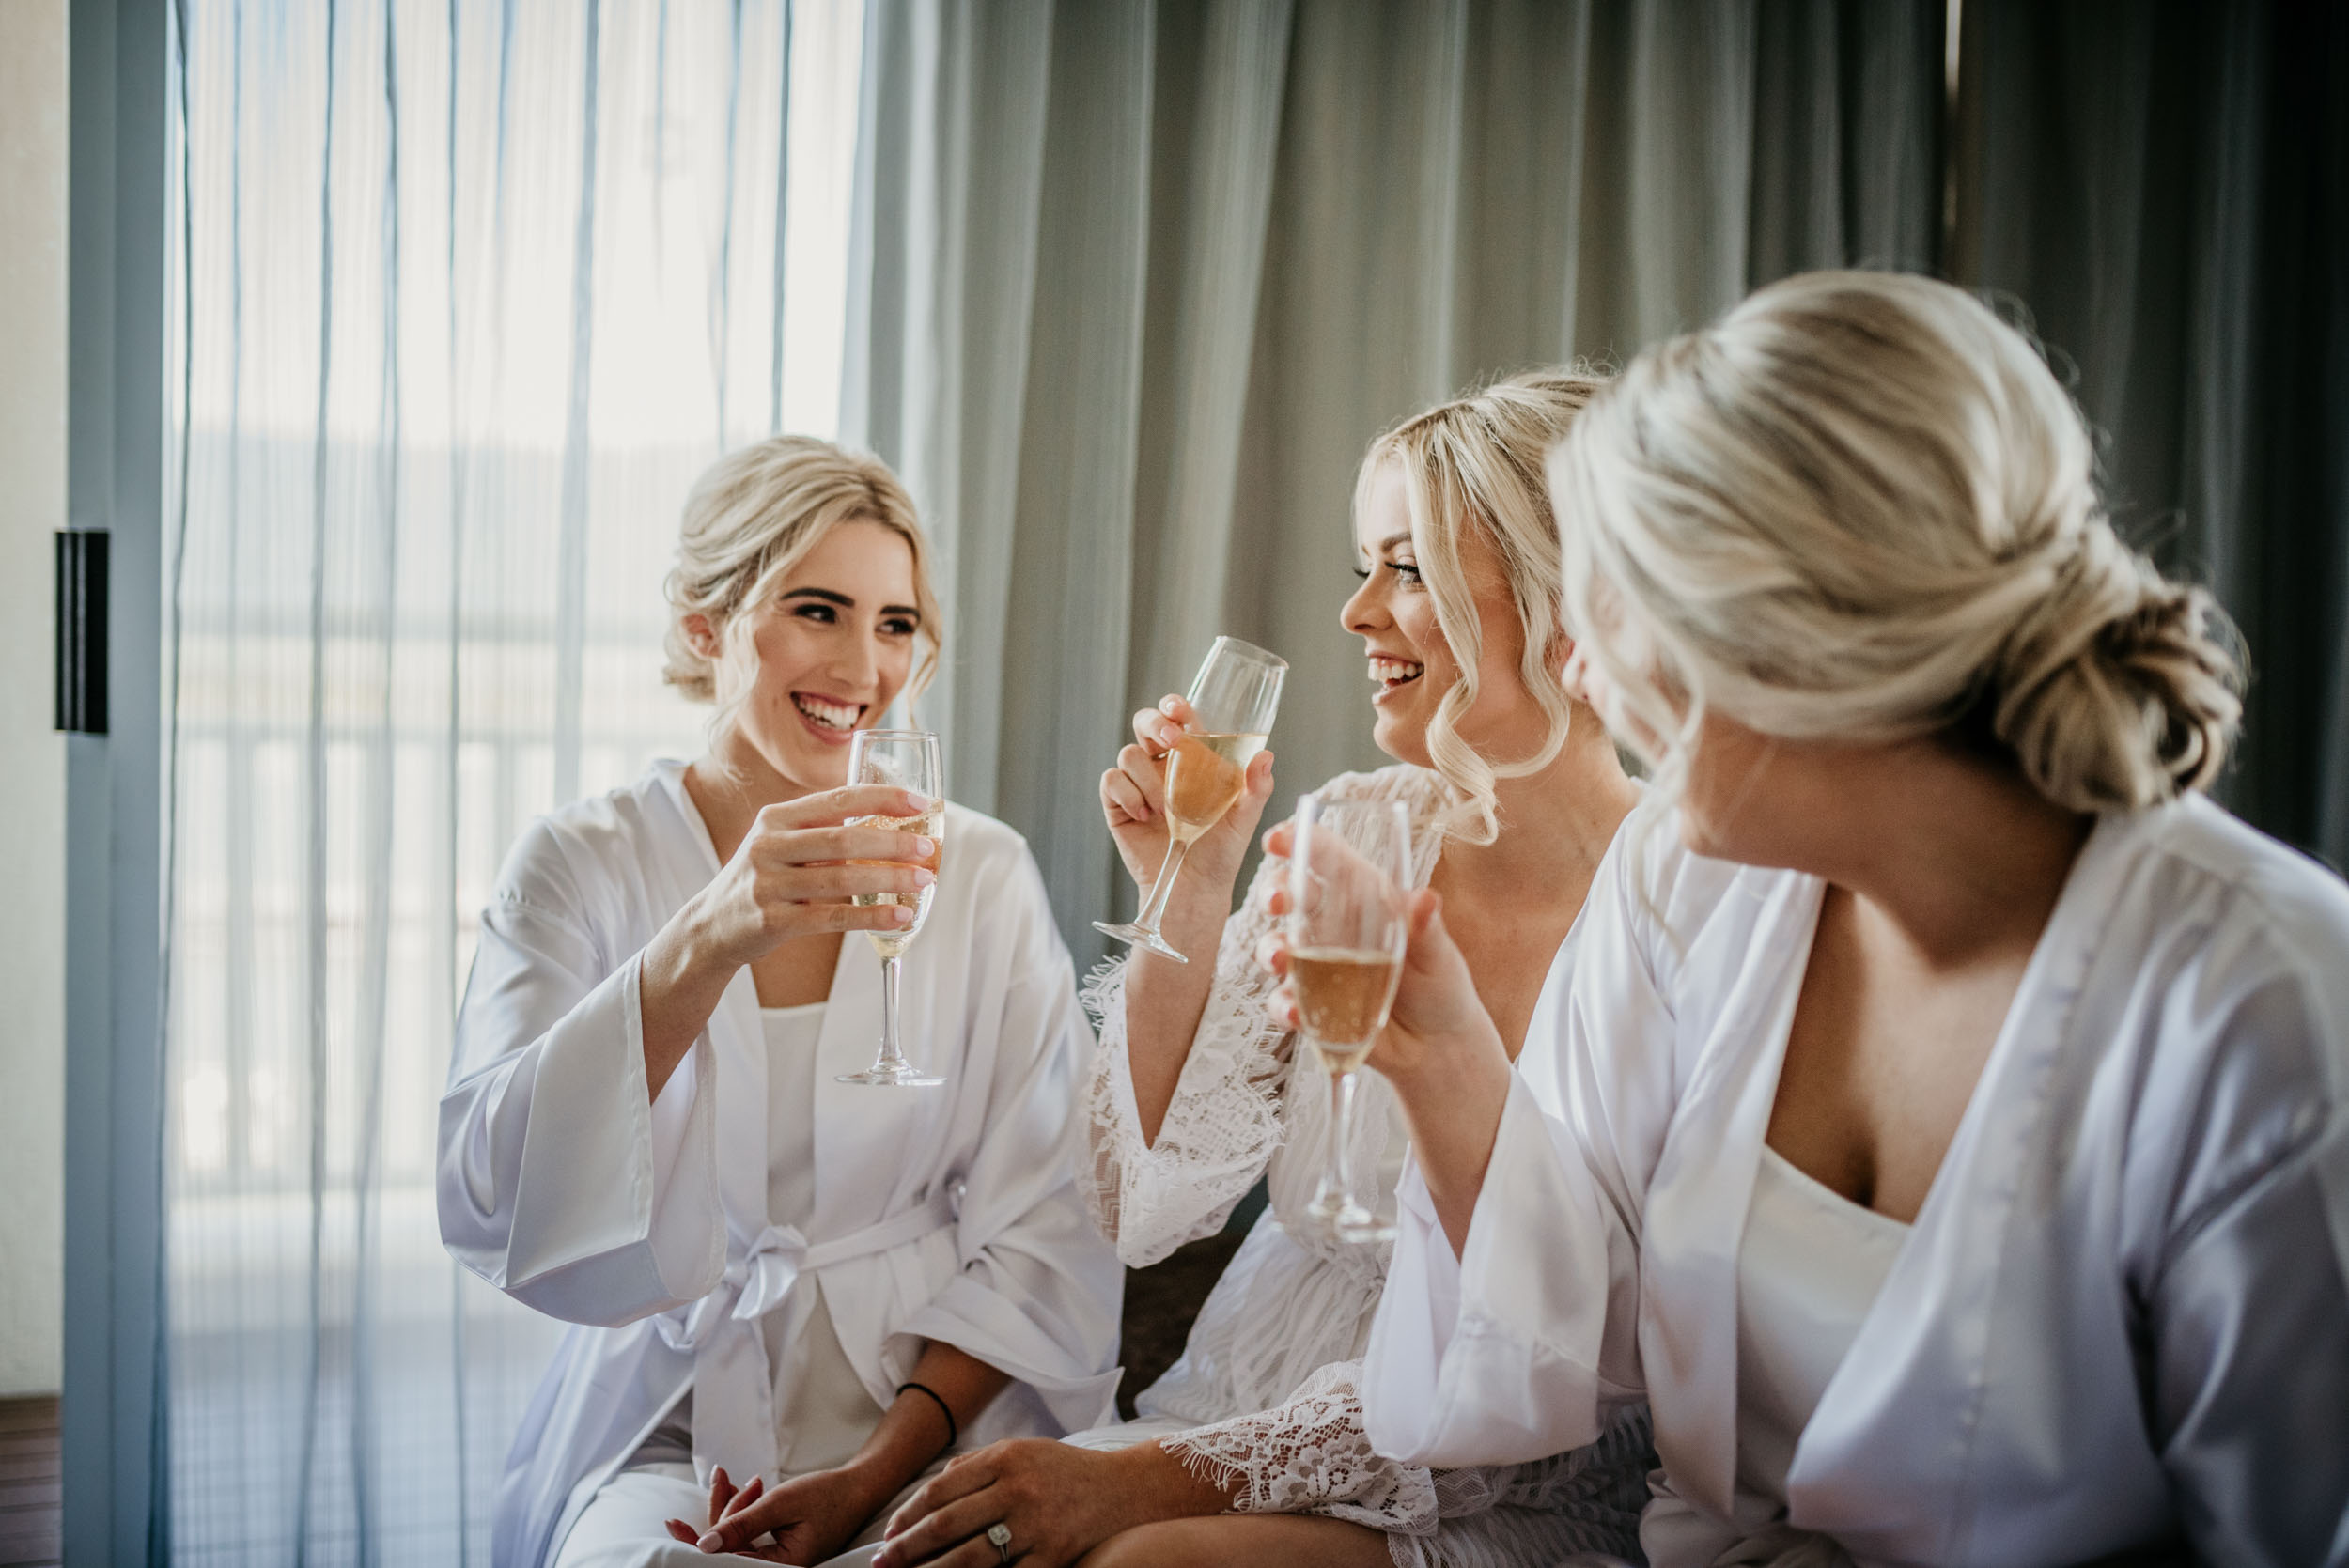 The Raw Photographer - Cairns Wedding Photographer - Laloli - Cairns Garden Wedding - Bride Dress - Destination Wed - Outdoor Reception - Queensland Ceremony-17.jpg